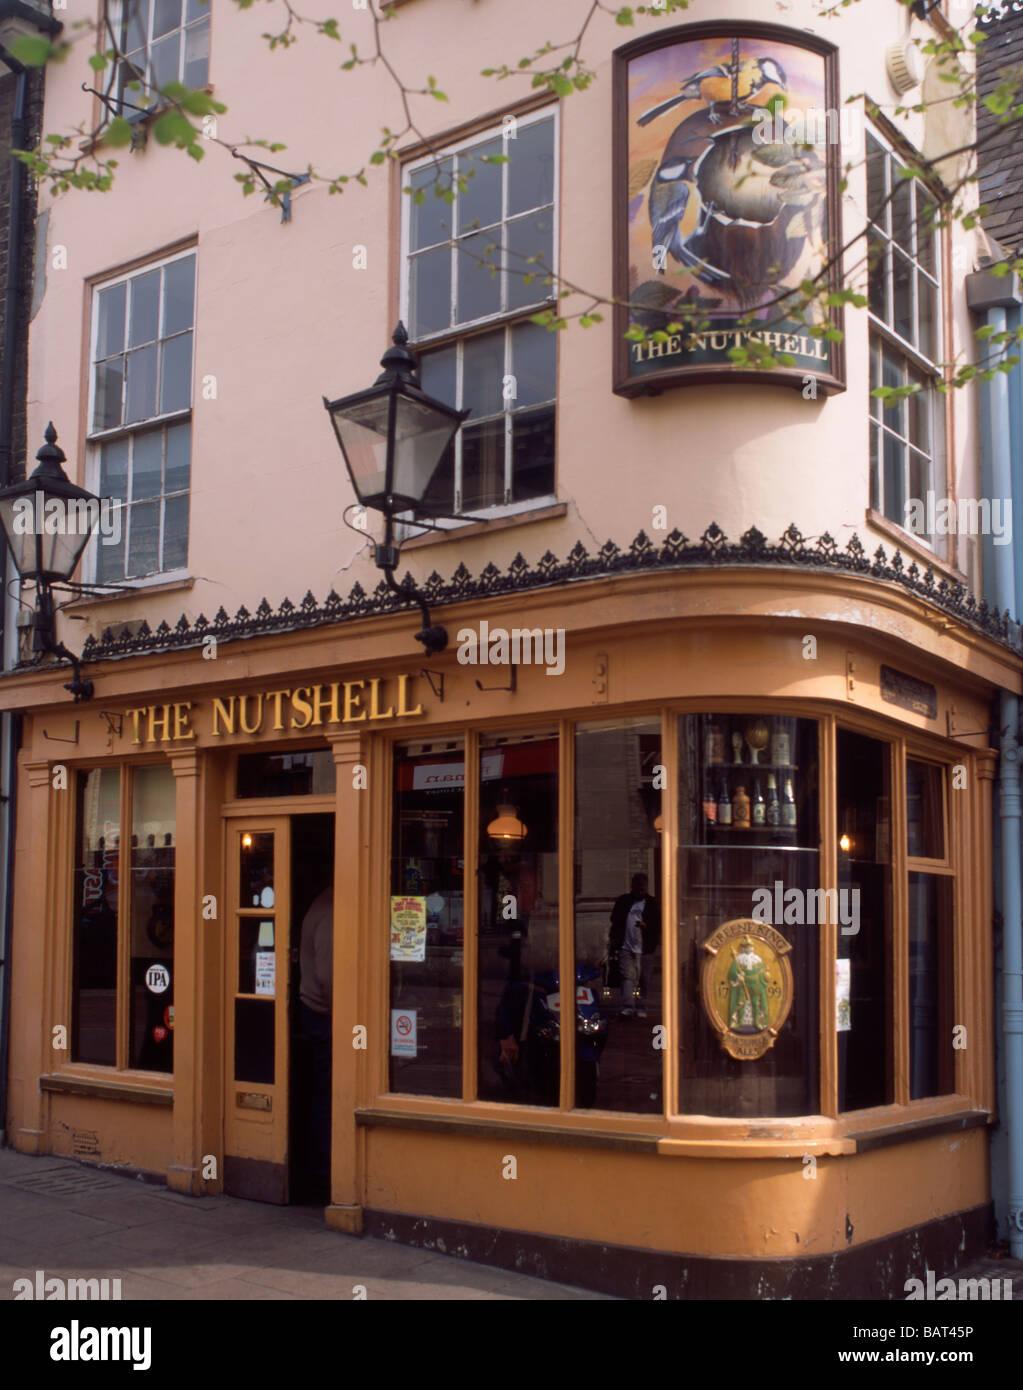 England Suffolk Bury StEdmunds Nutshell pub - Stock Image